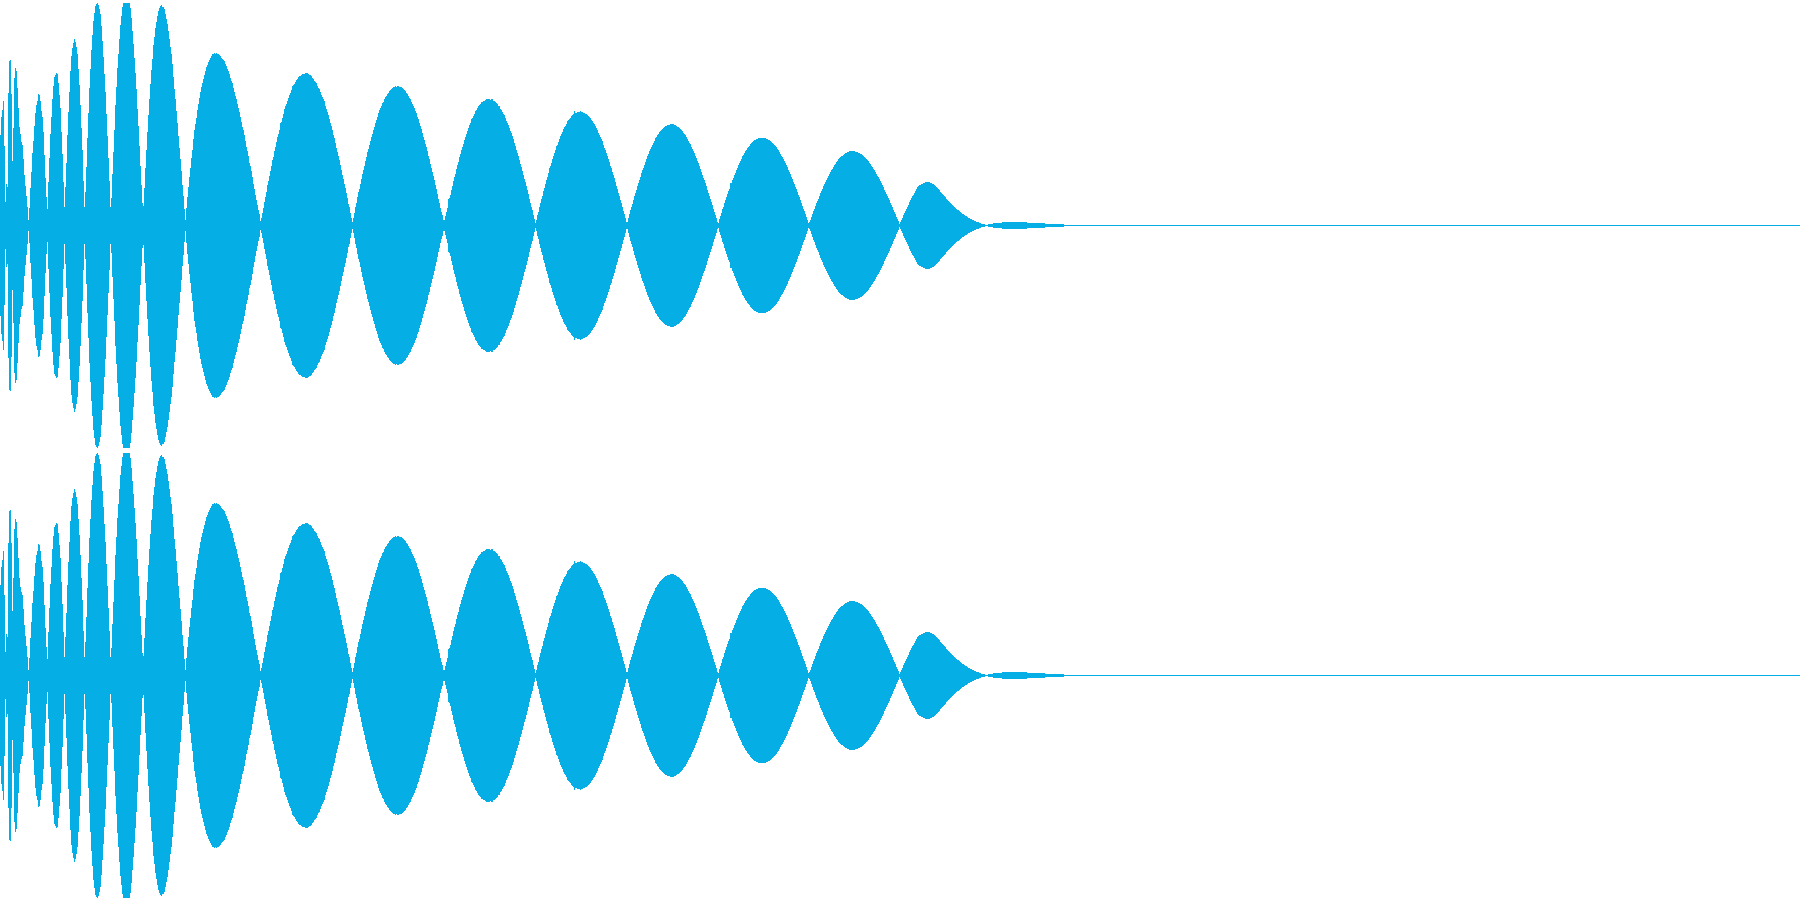 DTM Kick 40 オリジナル音源の再生済みの波形